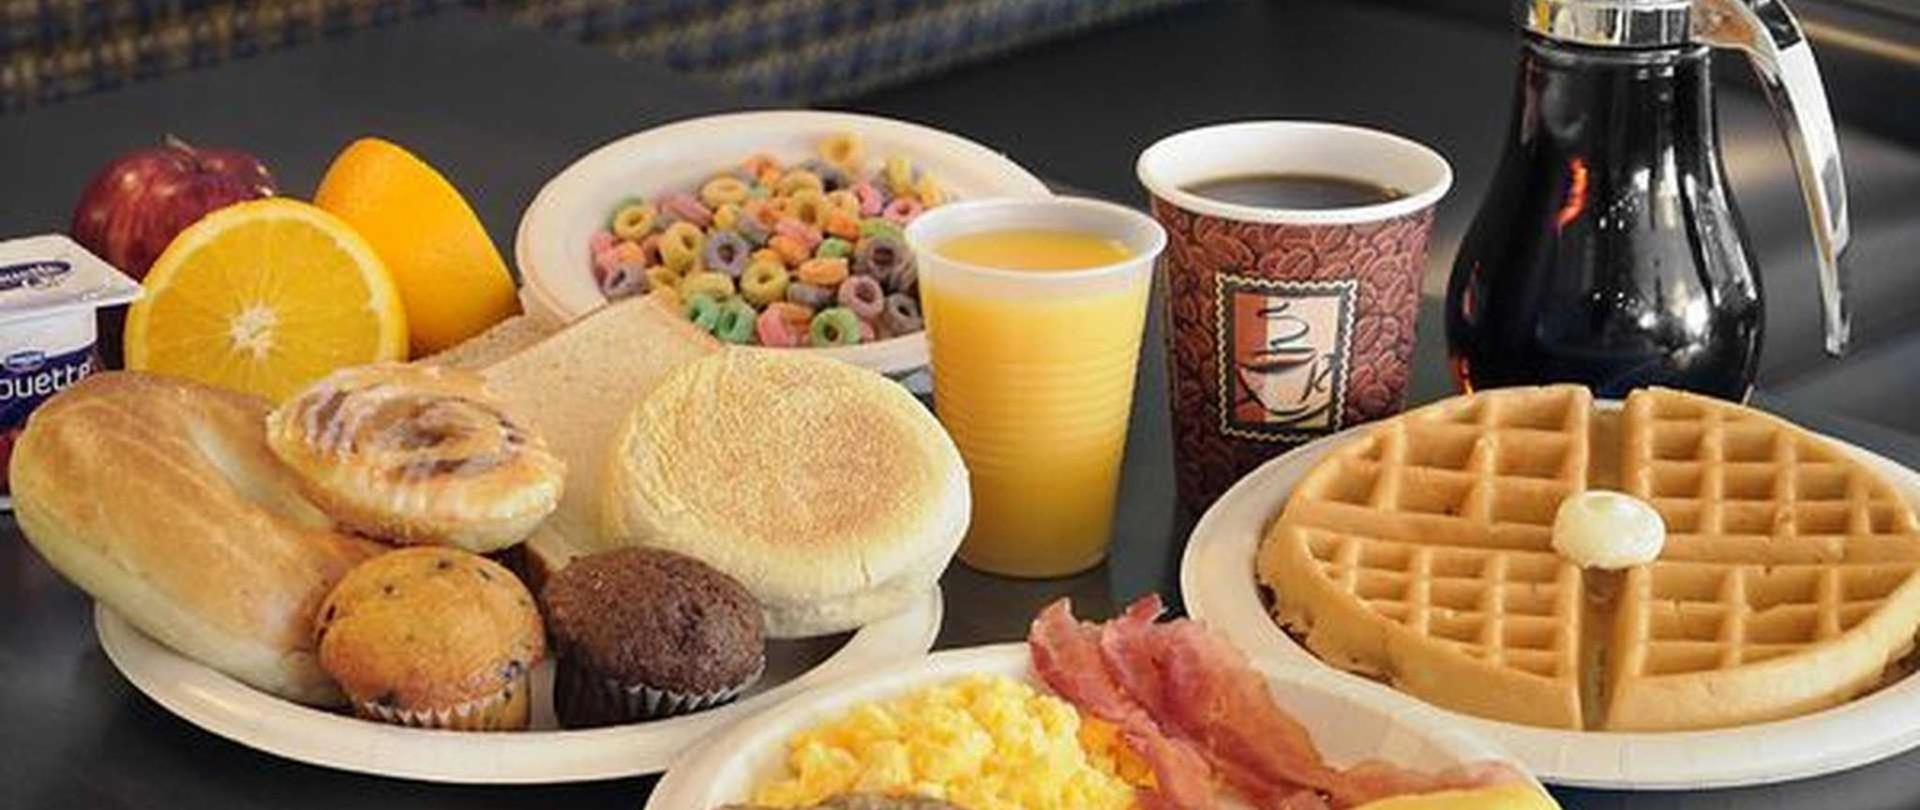 full_hot_breakfast_available_daily_.jpg.1920x810_default.jpeg